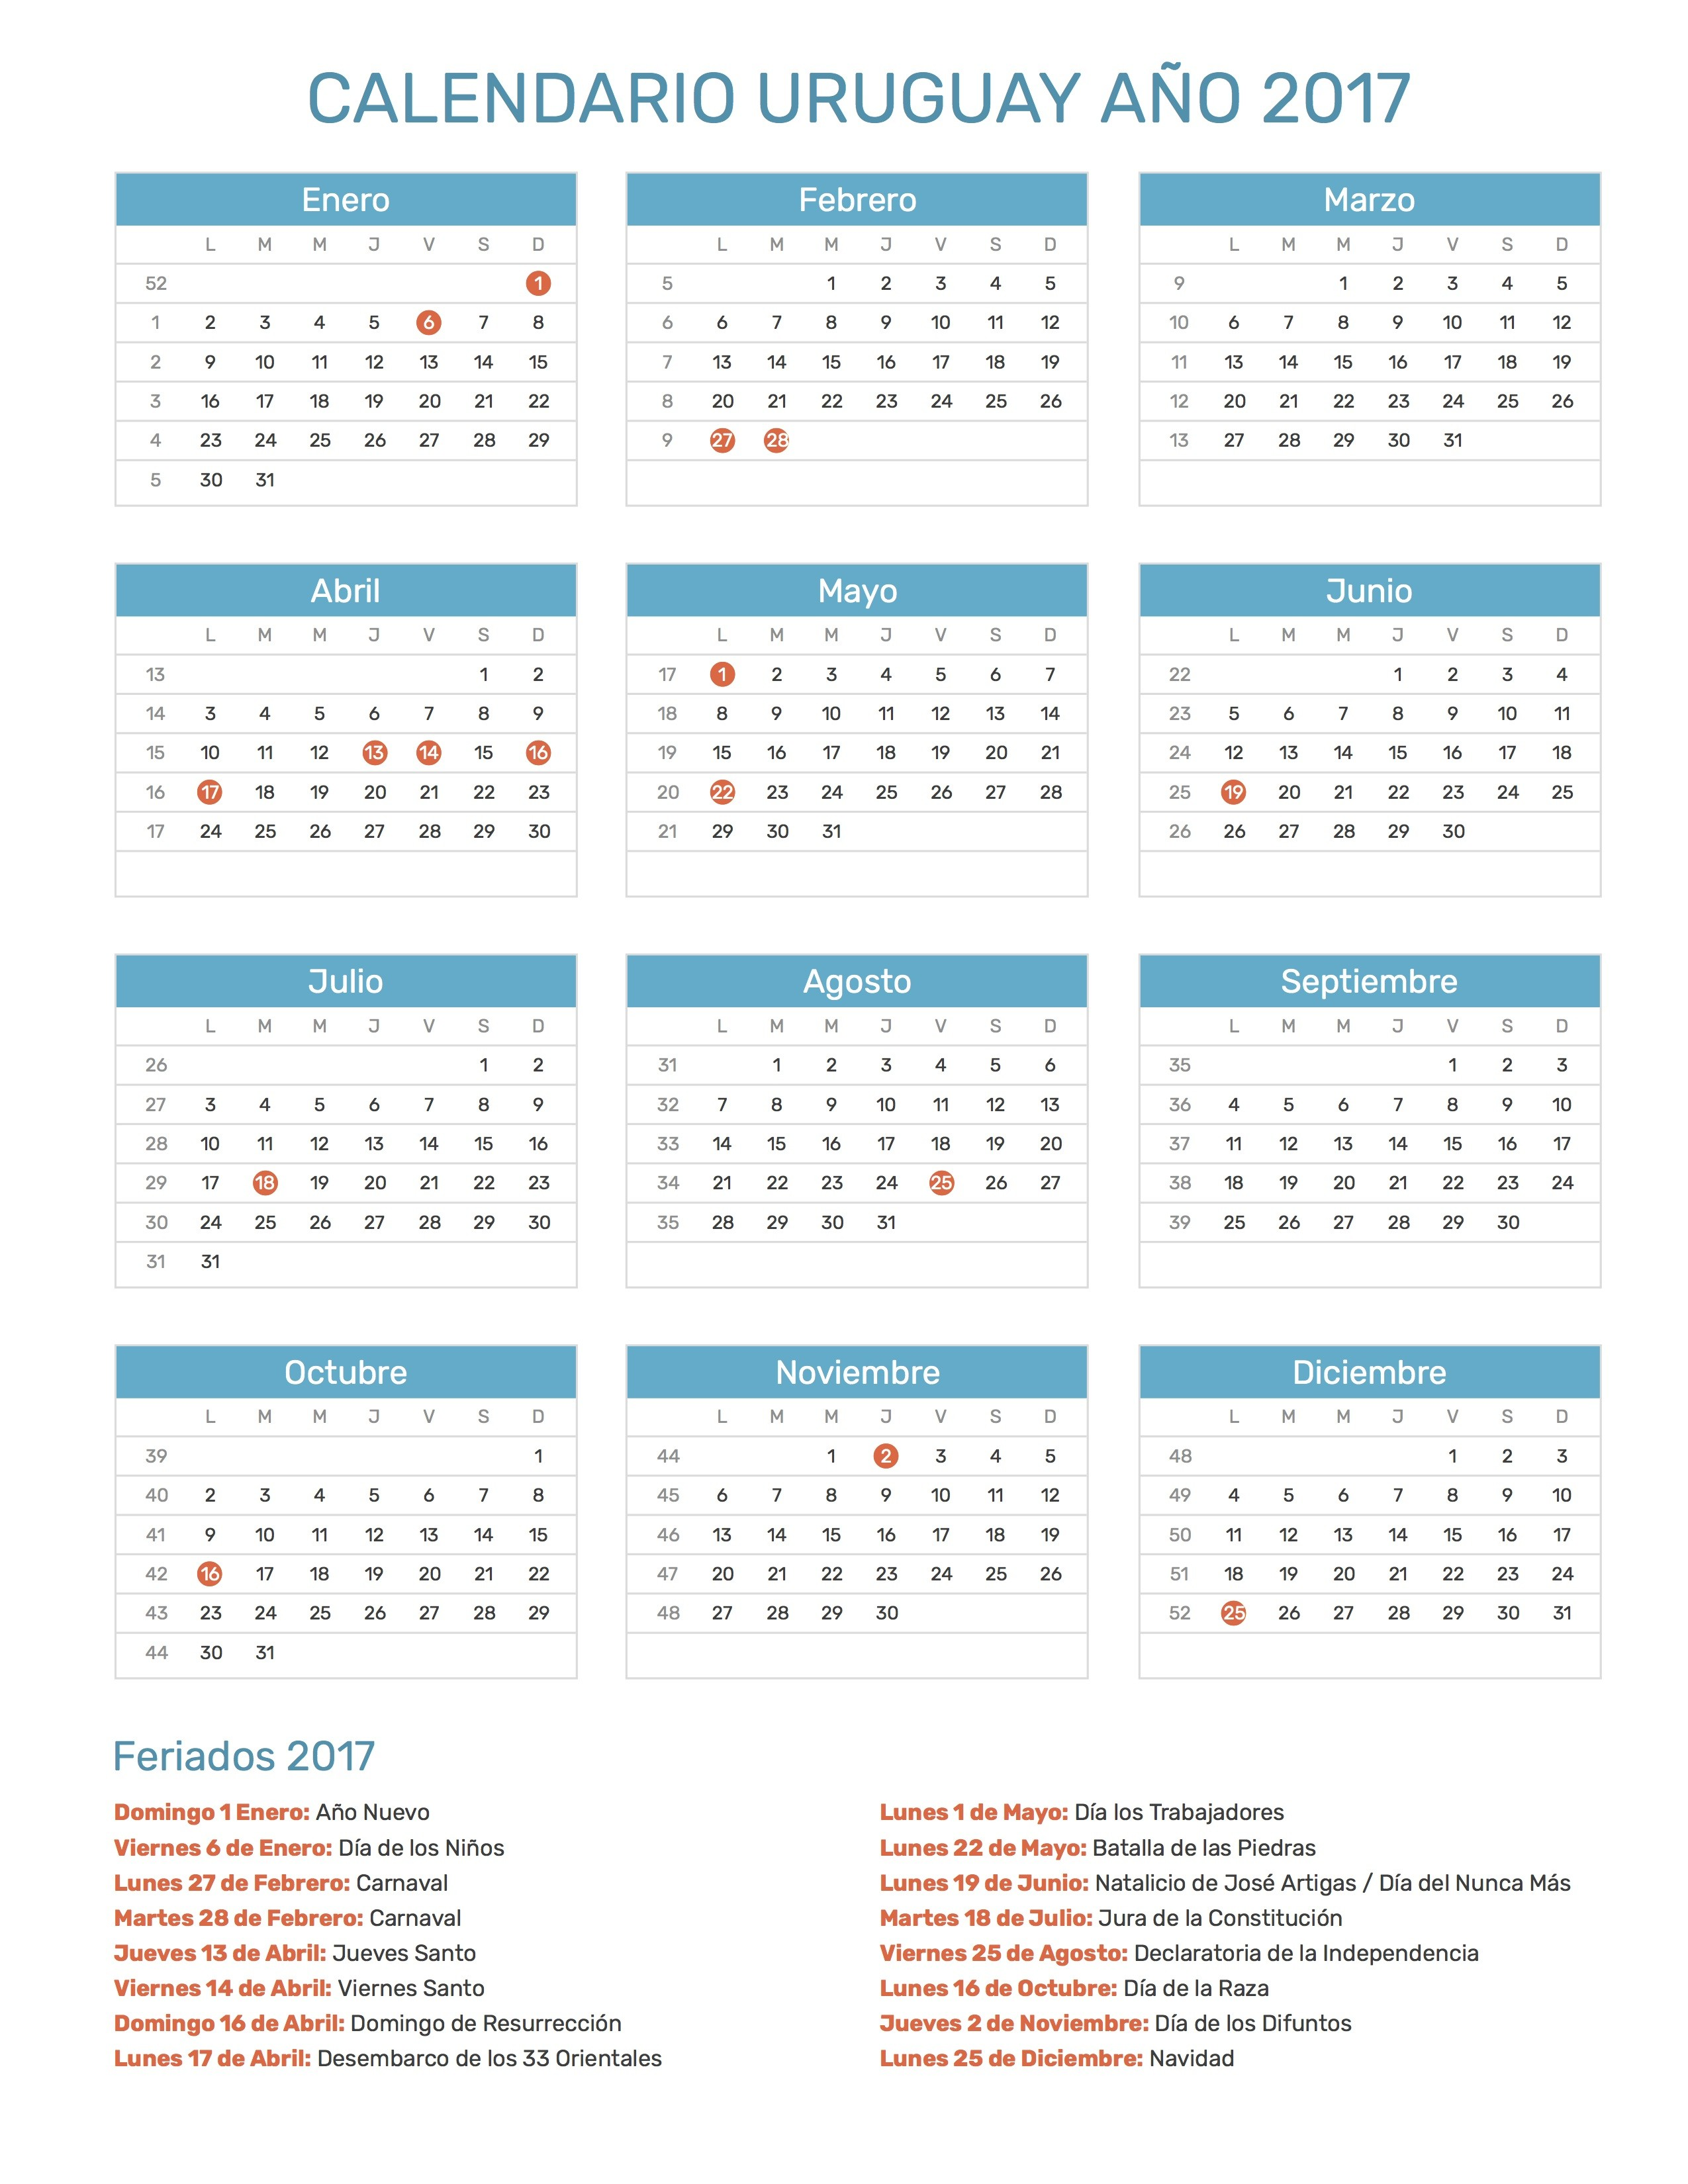 paras 2018 Calendar printable for Free Download India USA UK